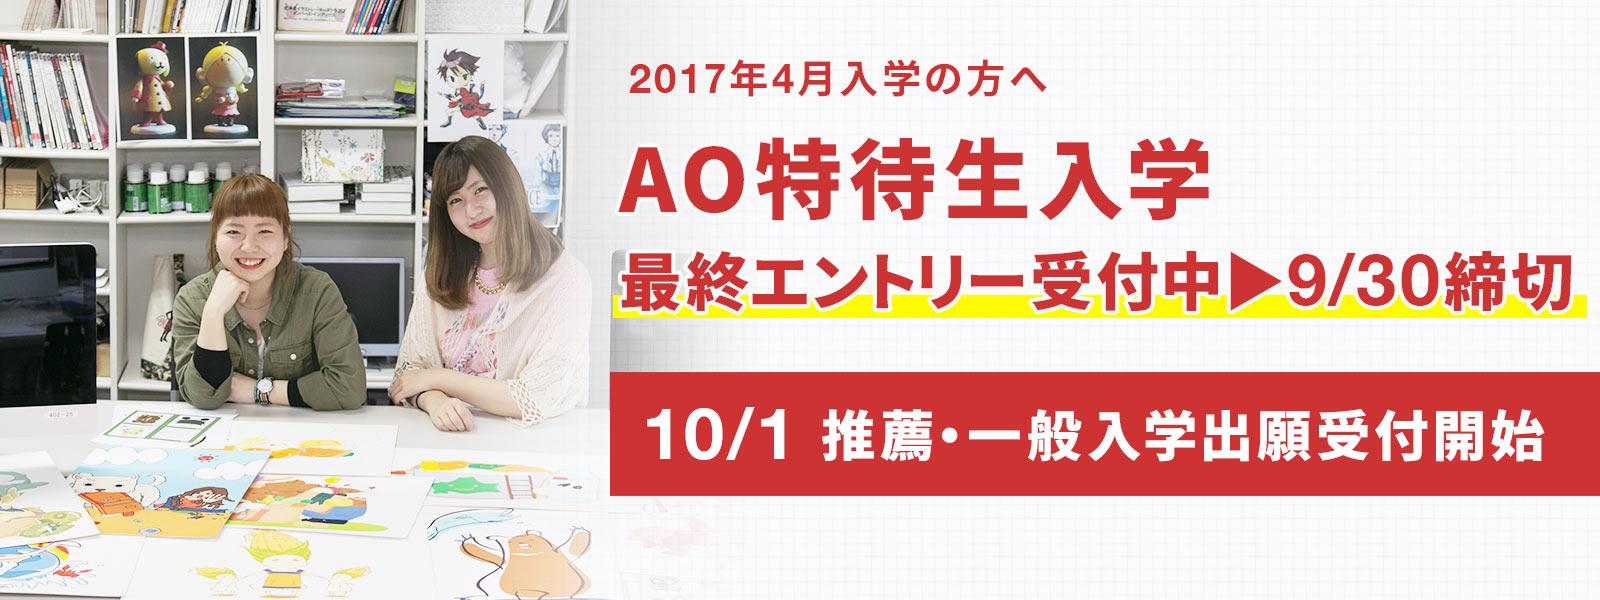 AO特待生入学 最終エントリー受付中